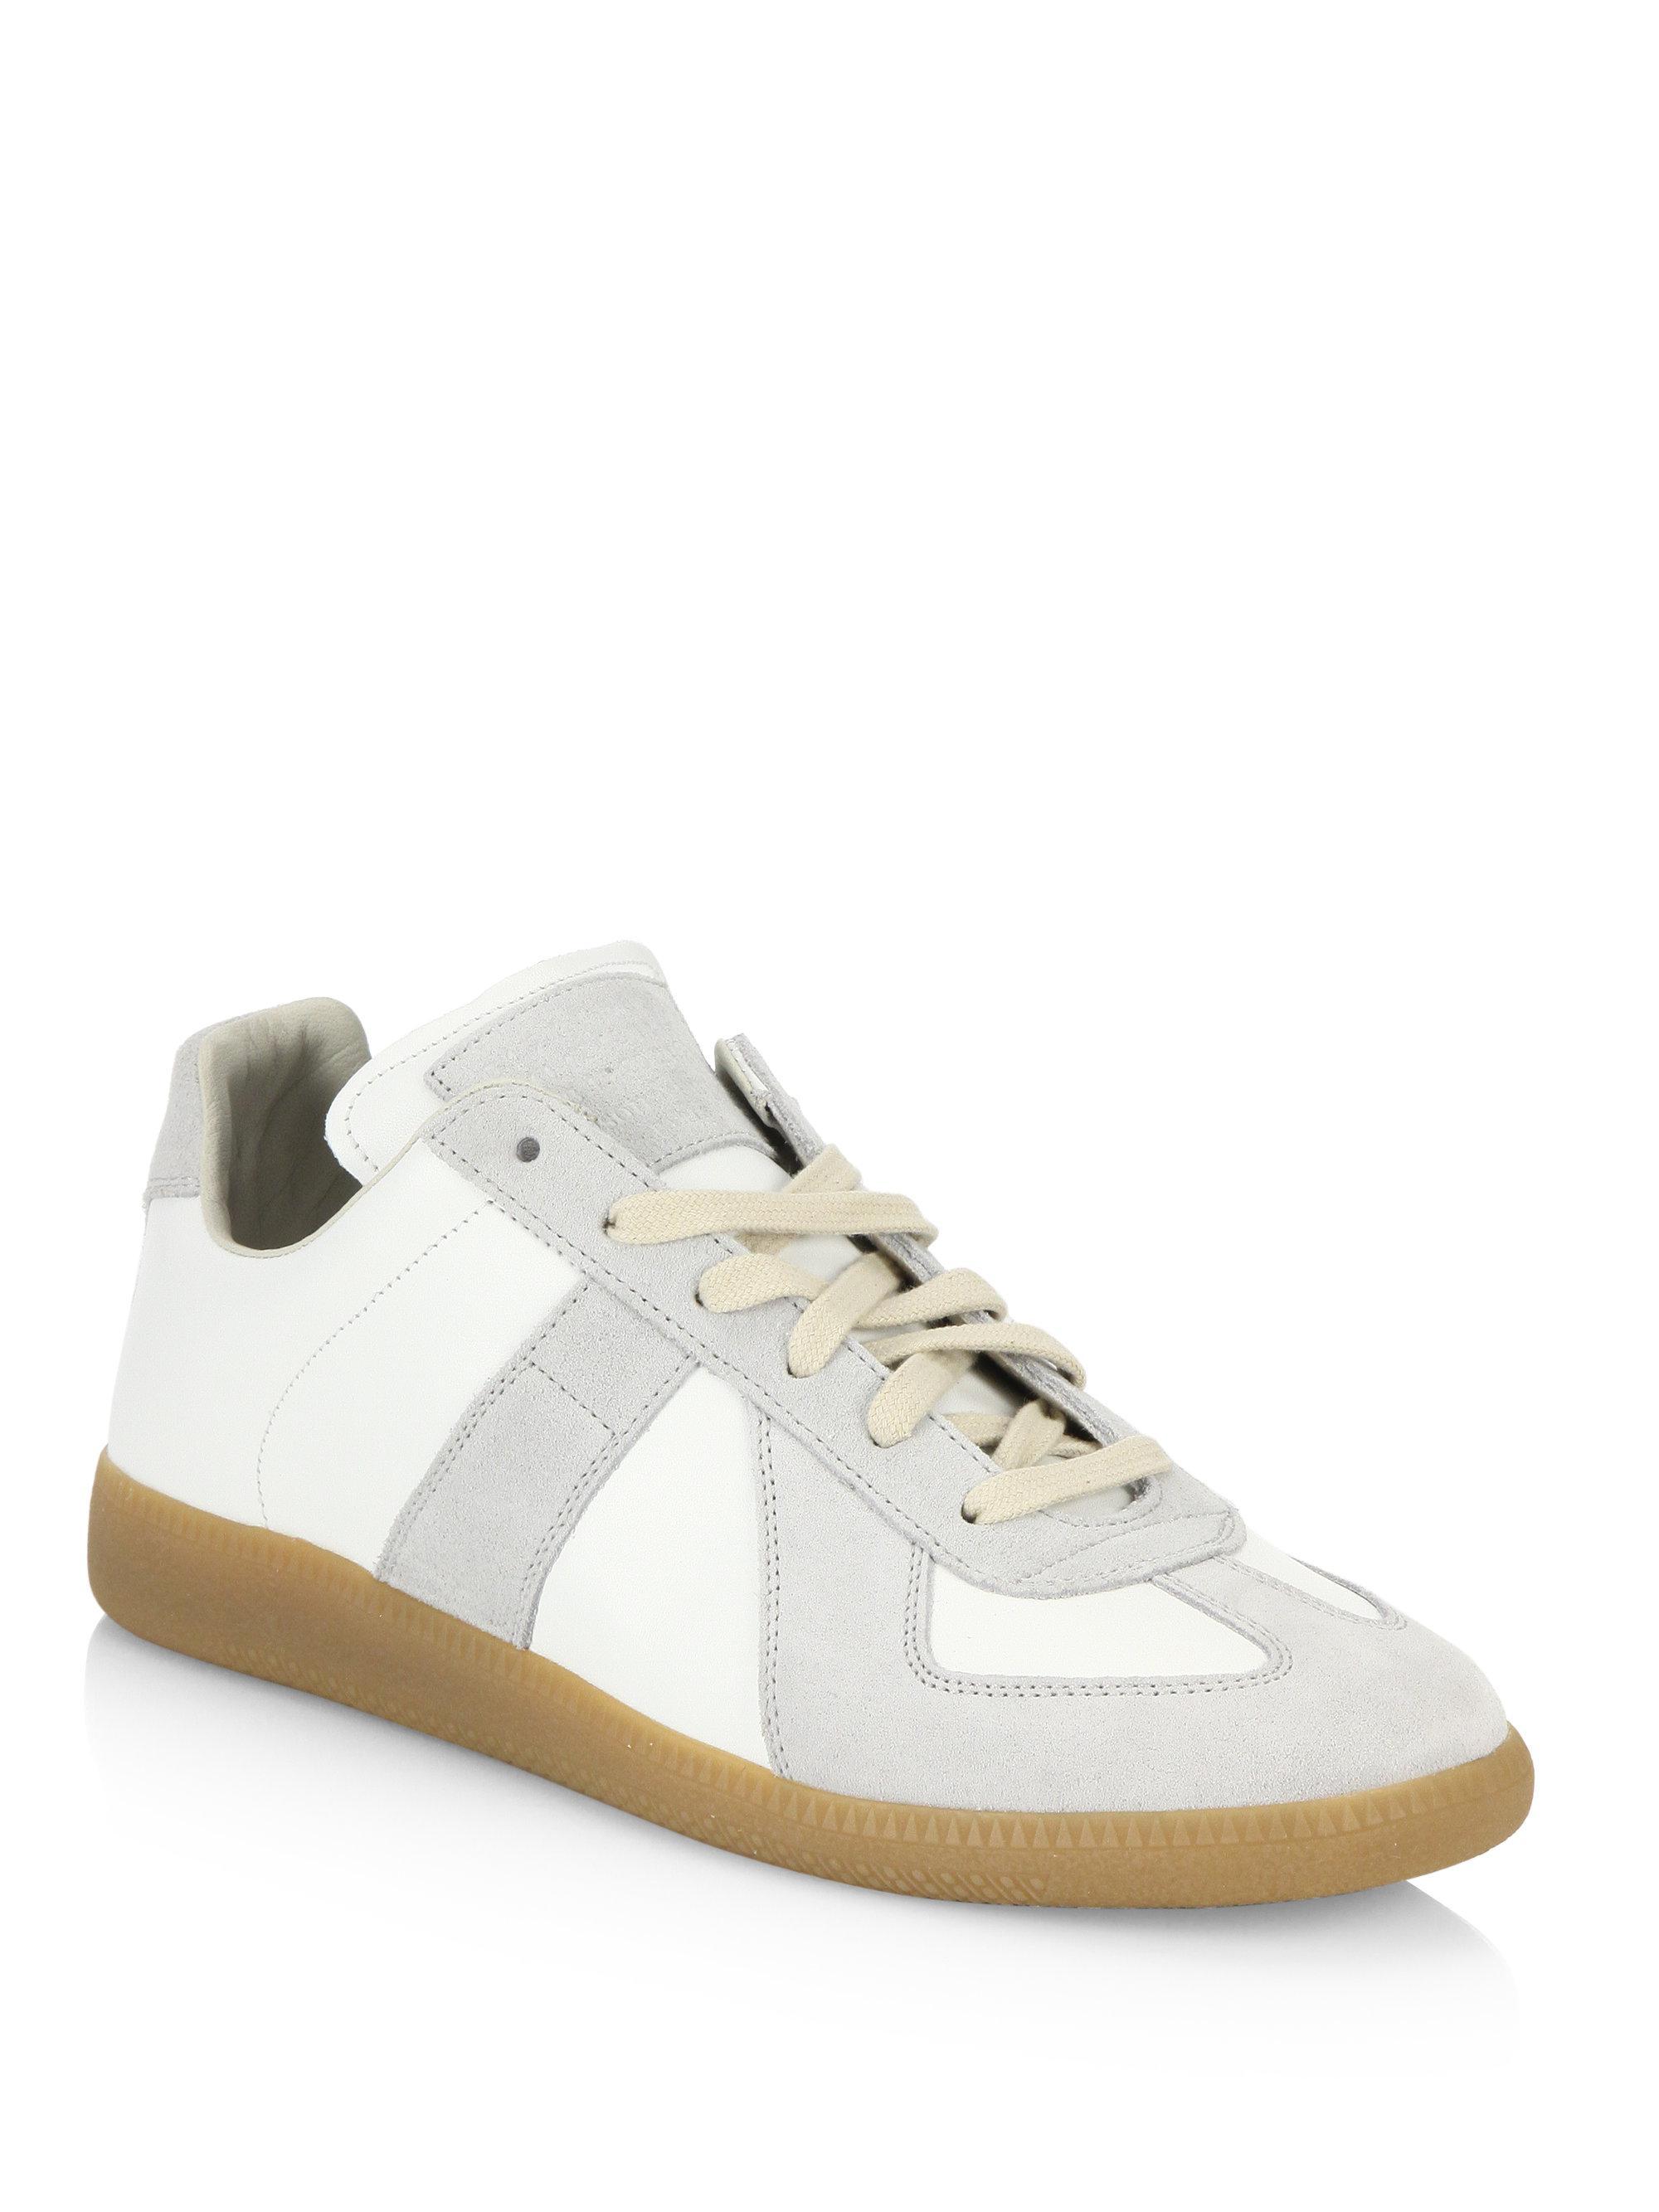 Mens Mens Replica Gabardine Sneakers Maison Martin Margiela xWt9i